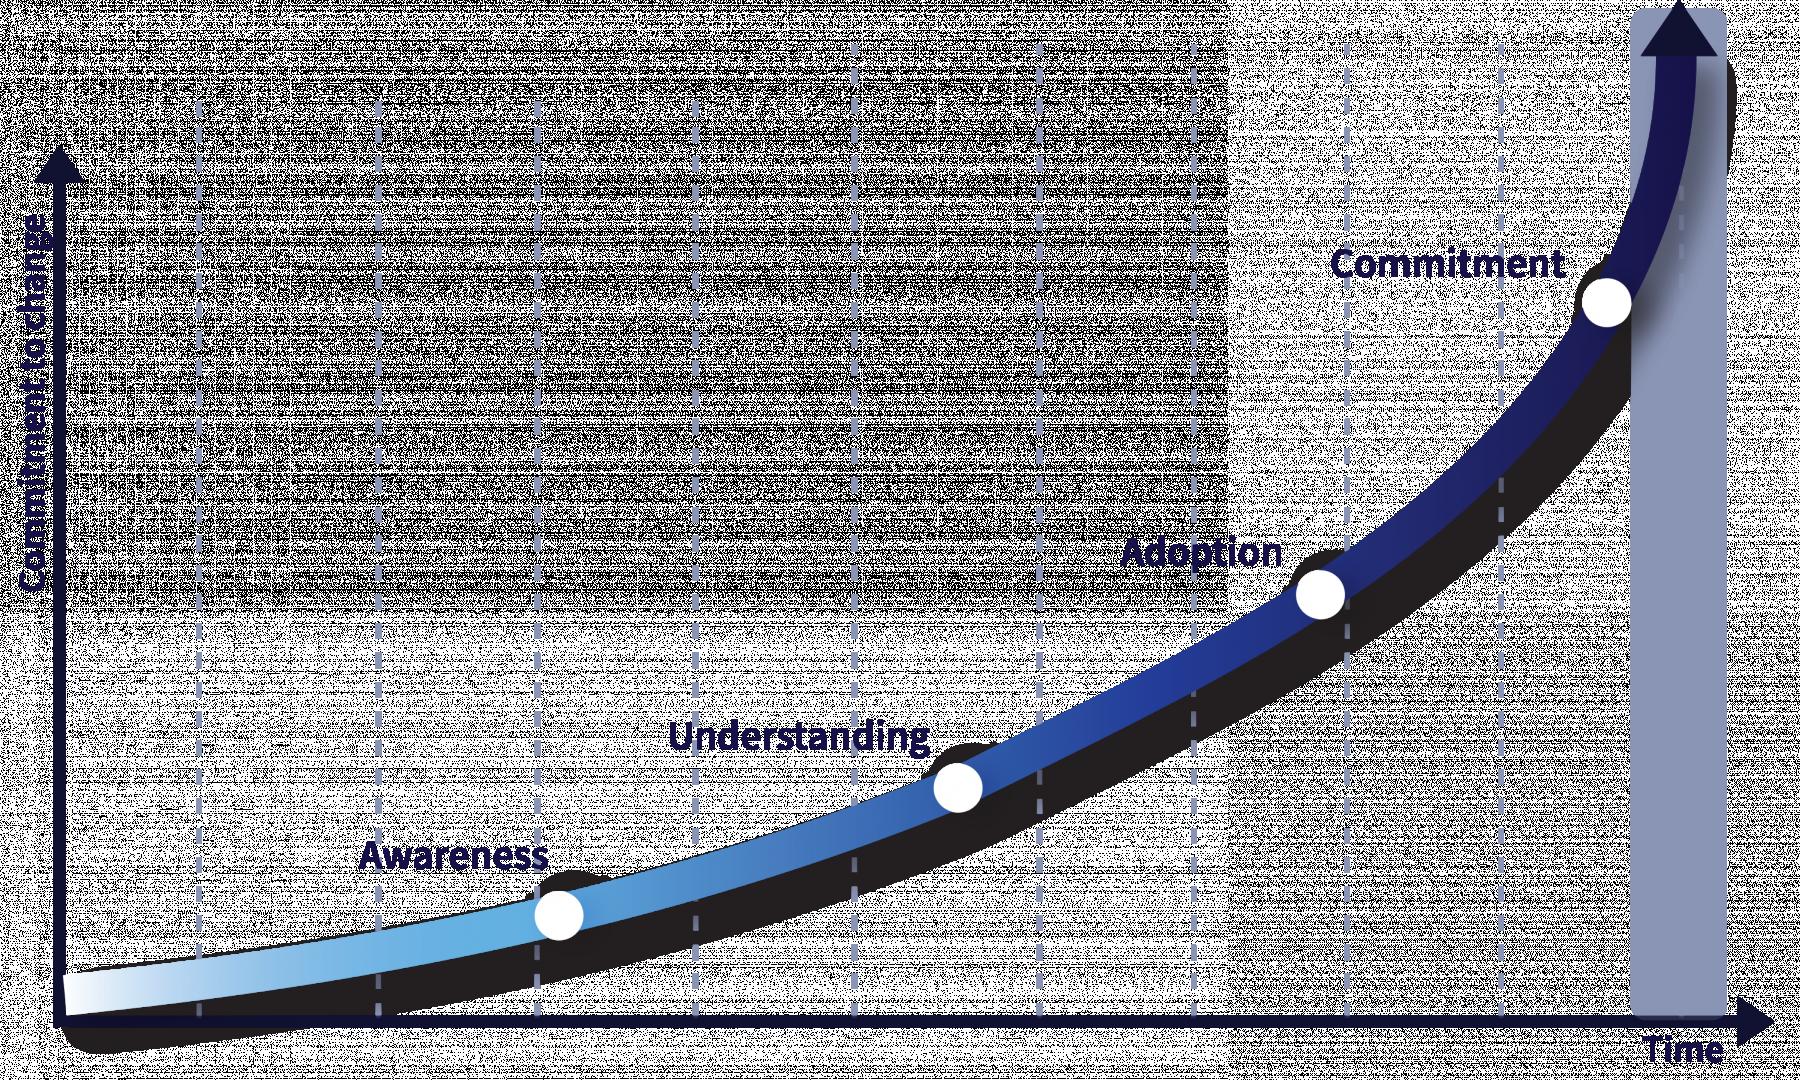 Change Commitment Curve